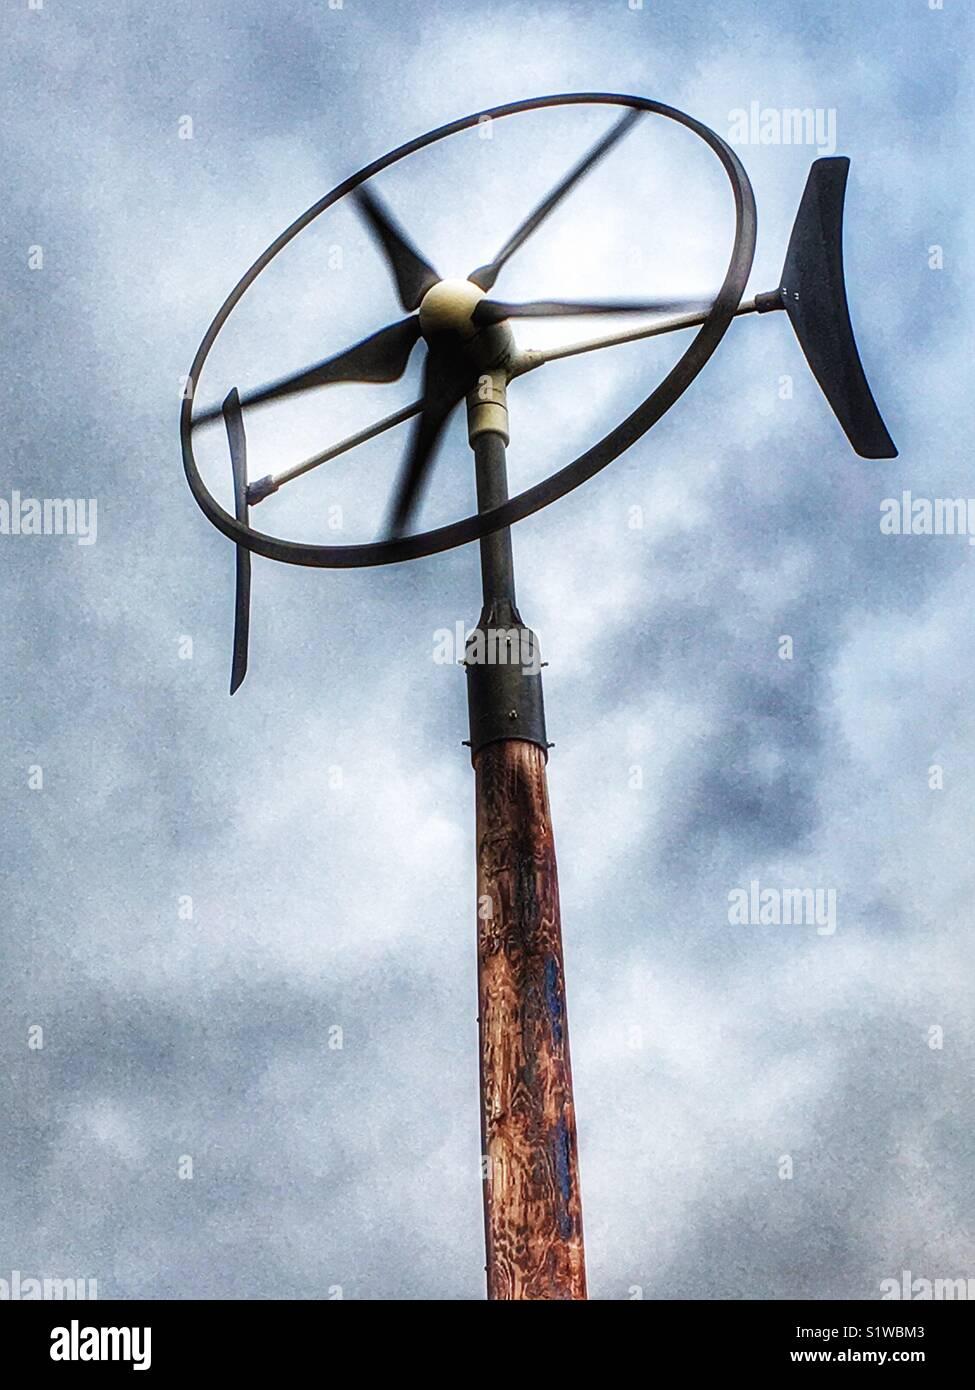 Domestic wind turbine UK - Stock Image